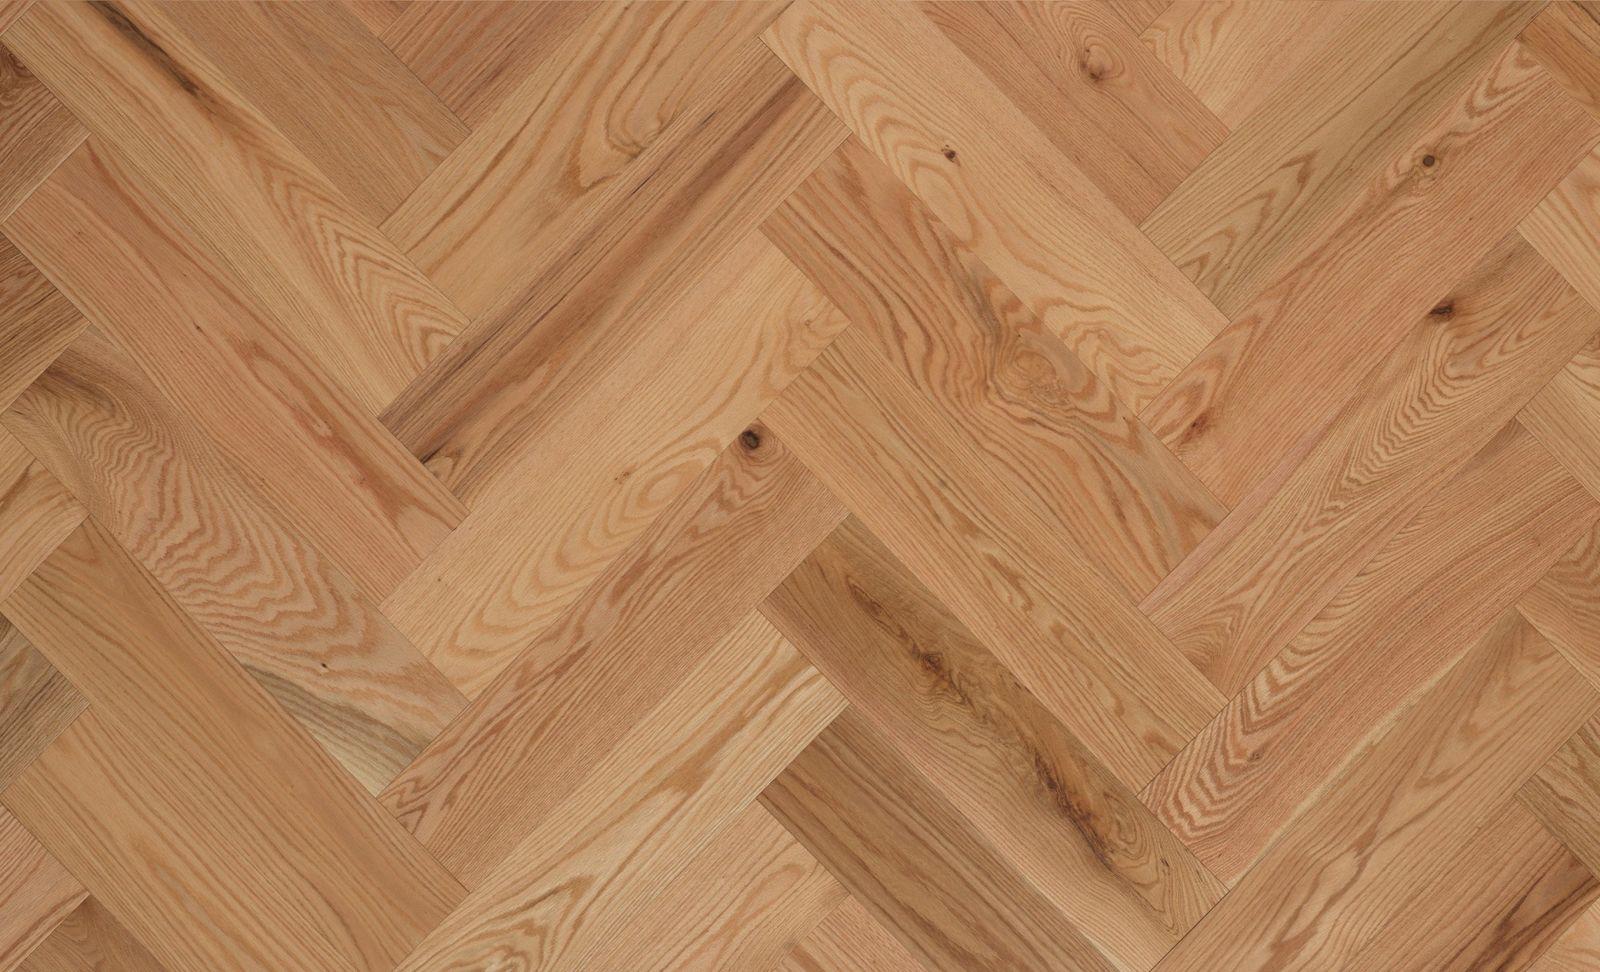 Mercier Wood Flooring Red Oak Natural RDKNTRL